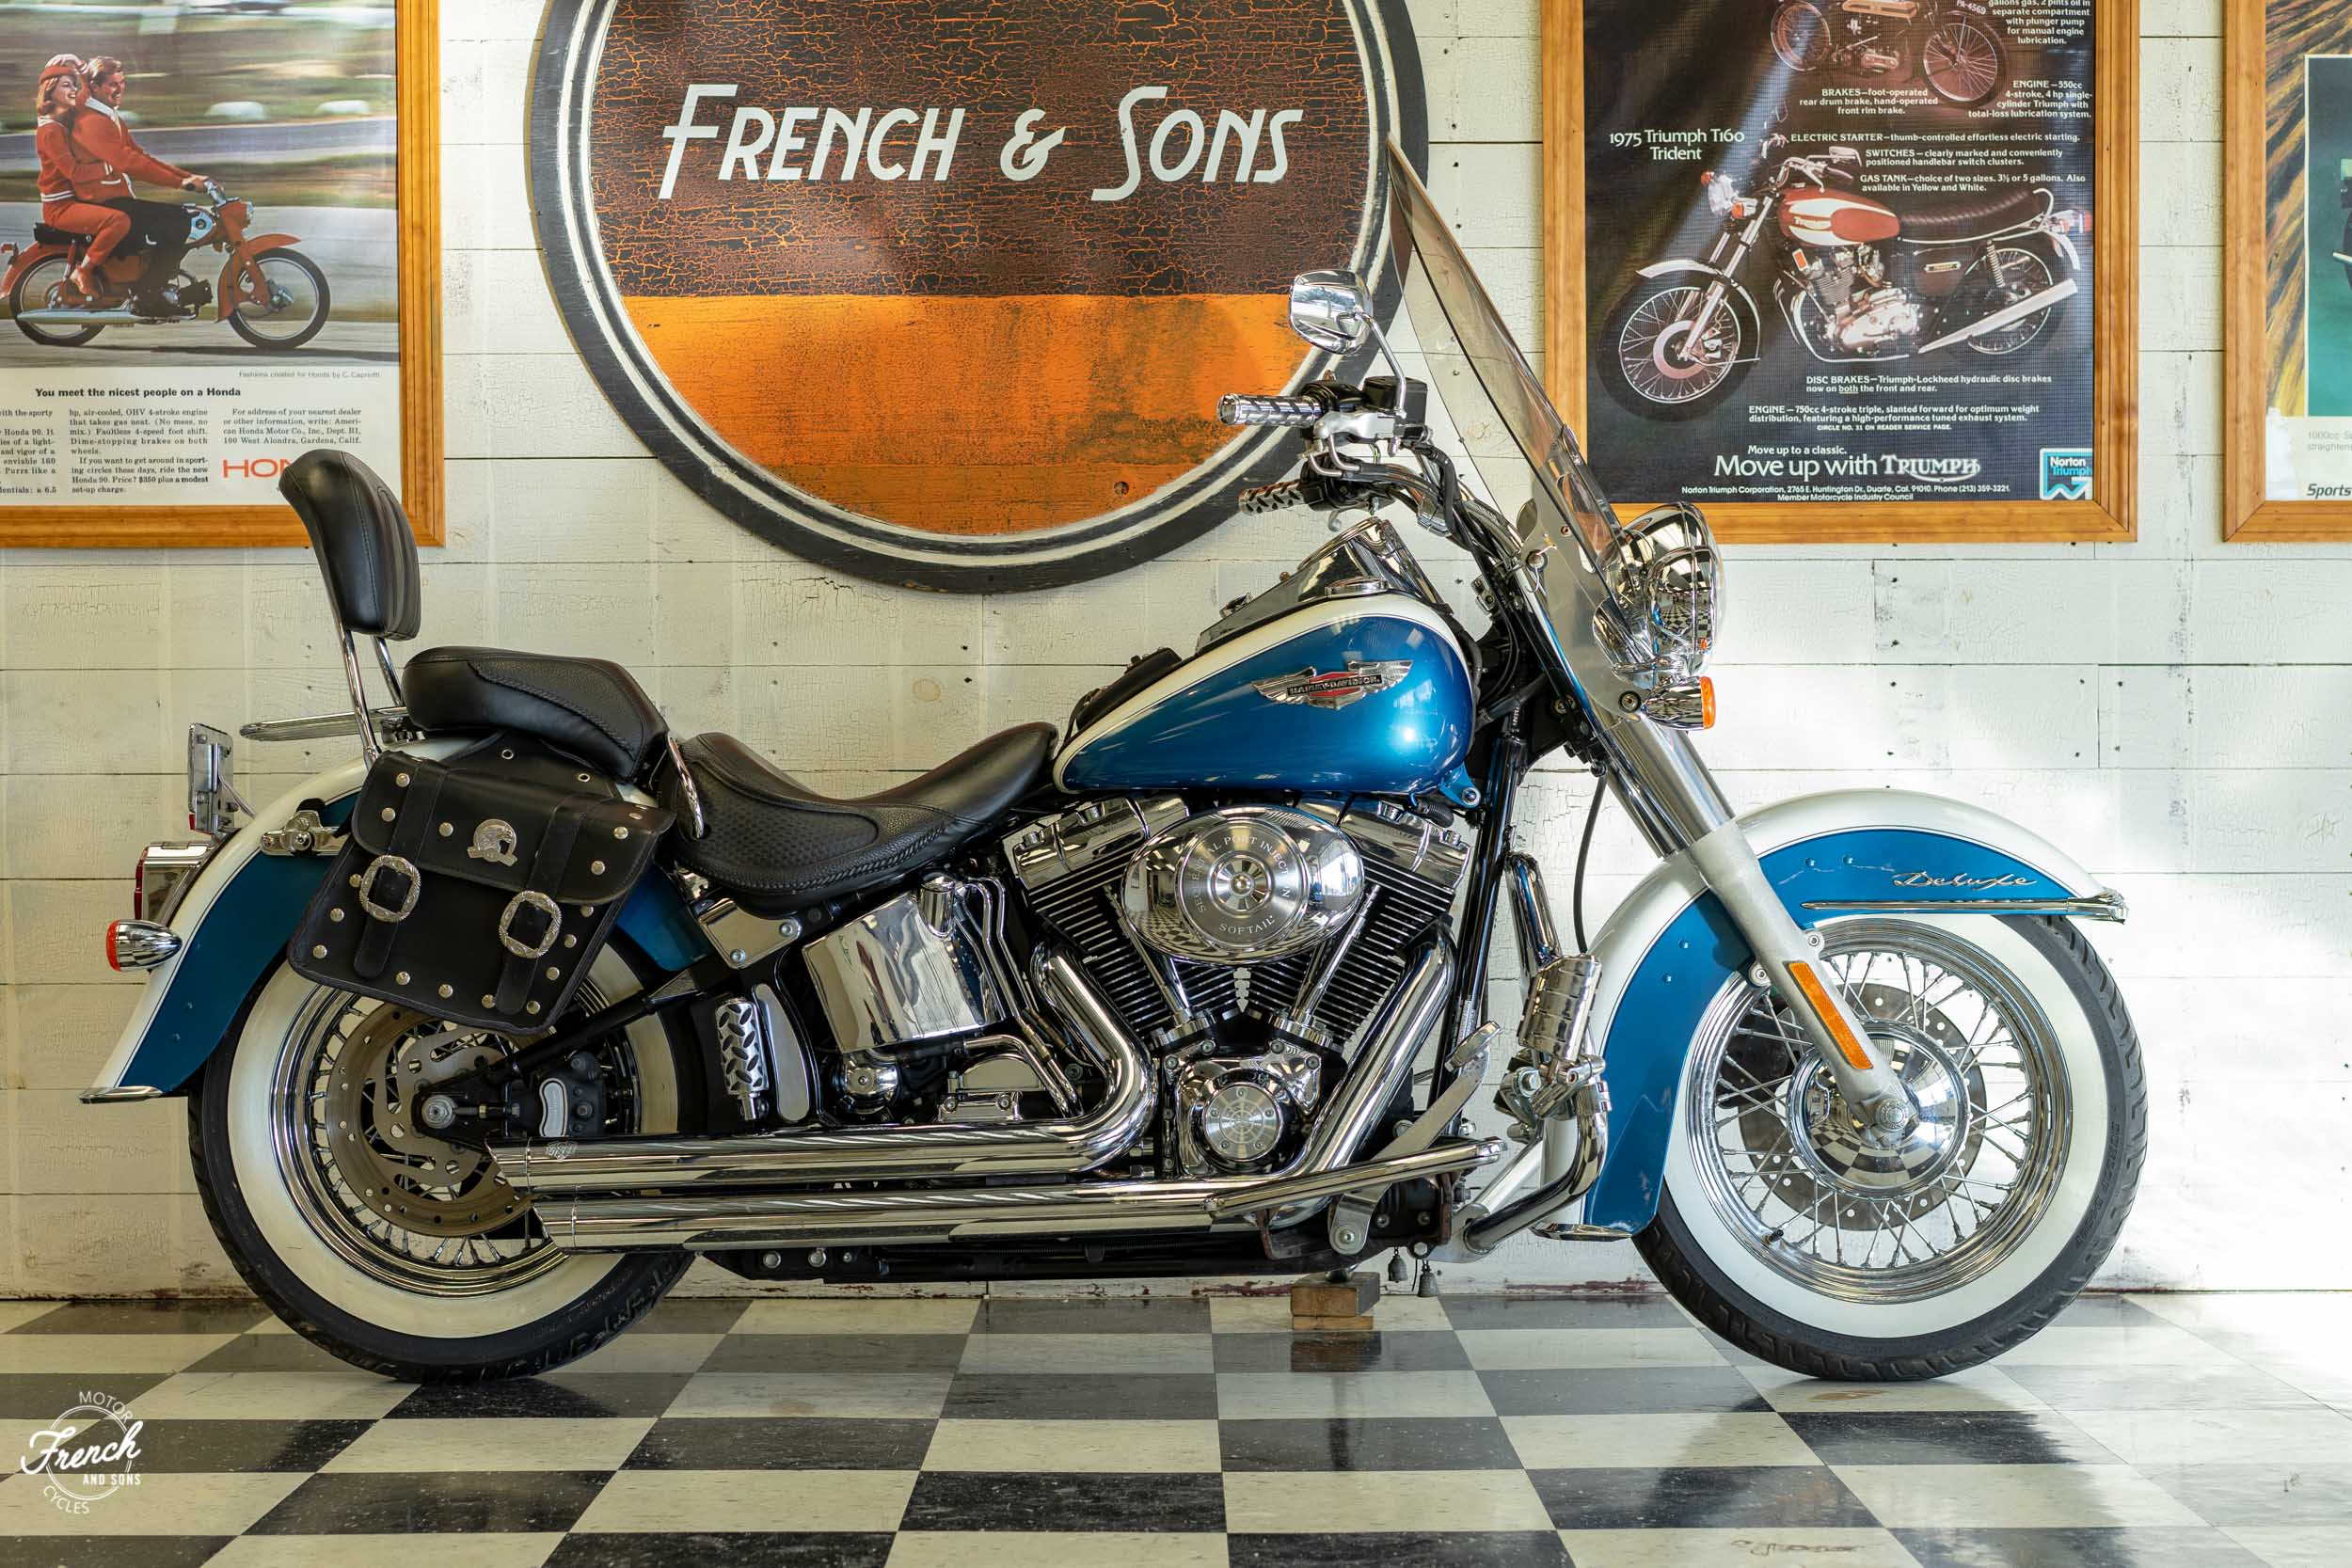 2005_Harley_Davidson_Softail_Deluxe-2.jpg